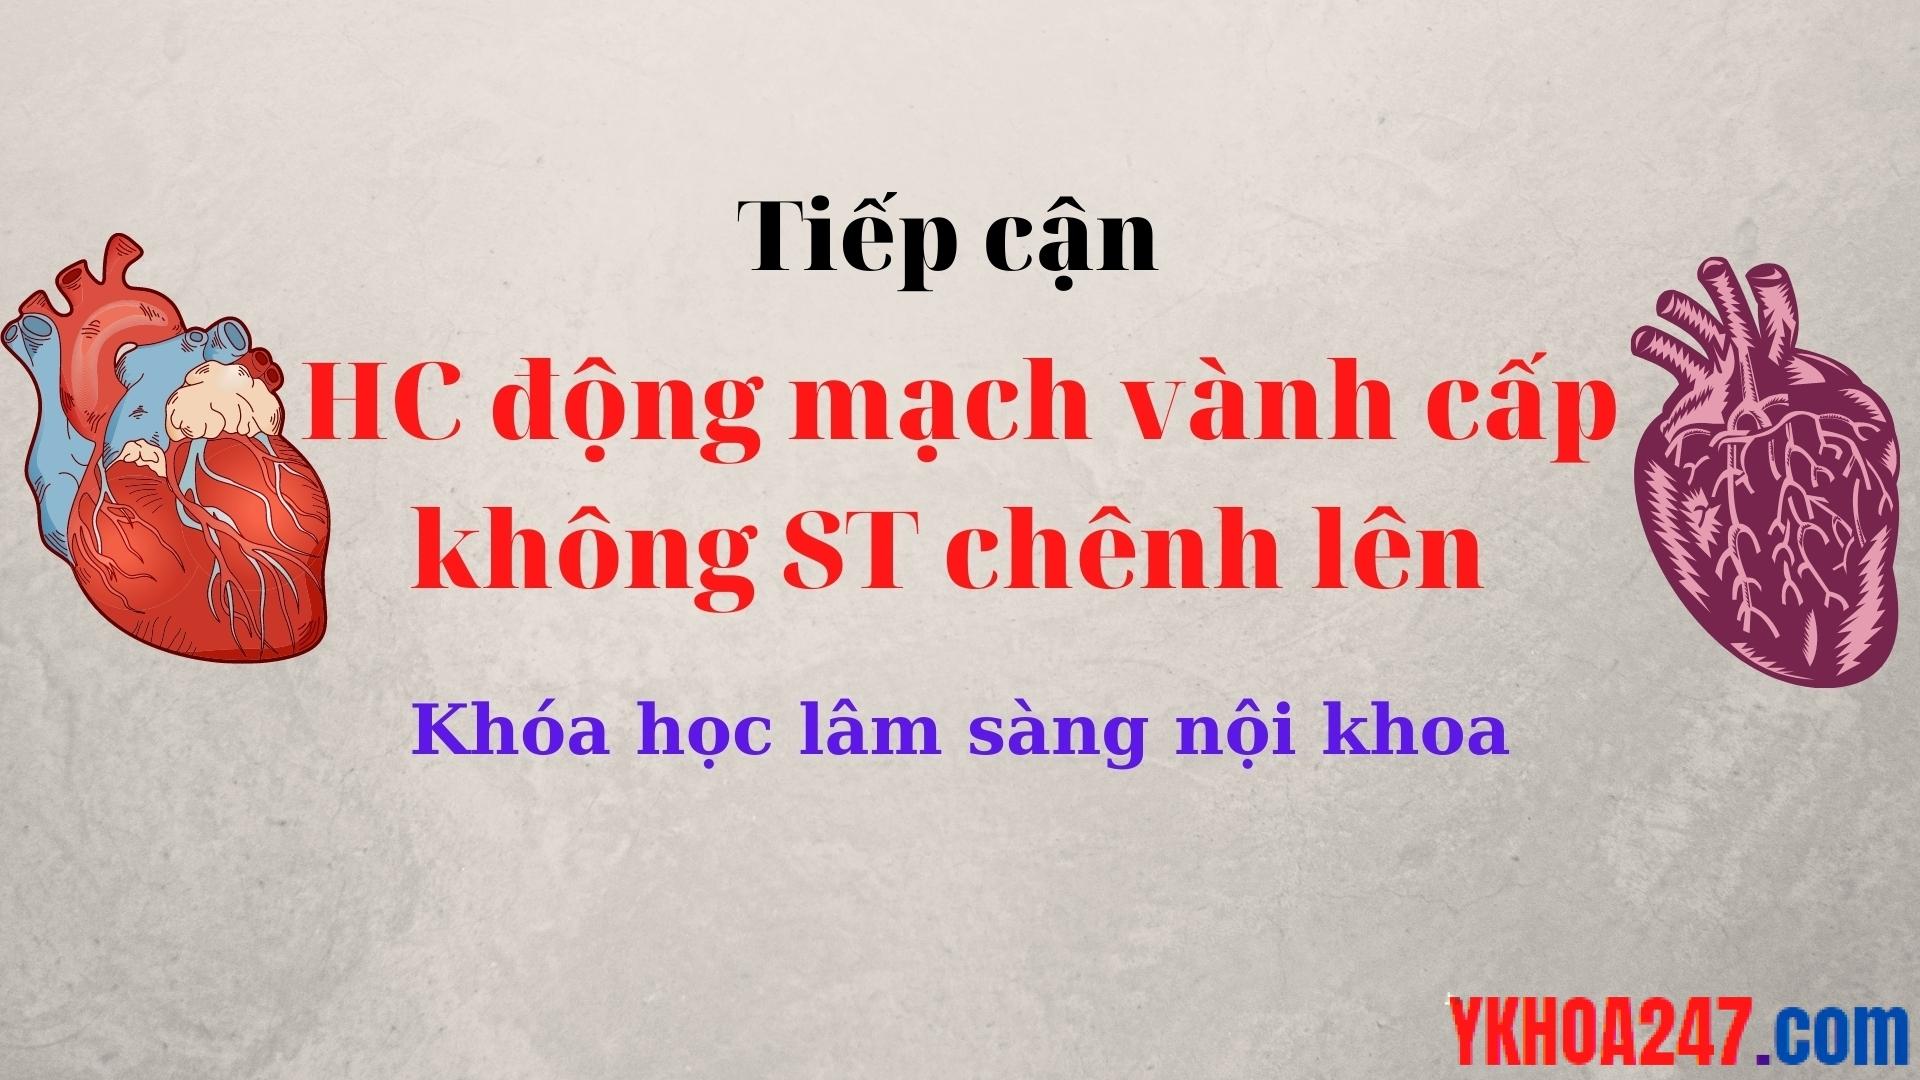 HCDMVC Khong ST chenh len